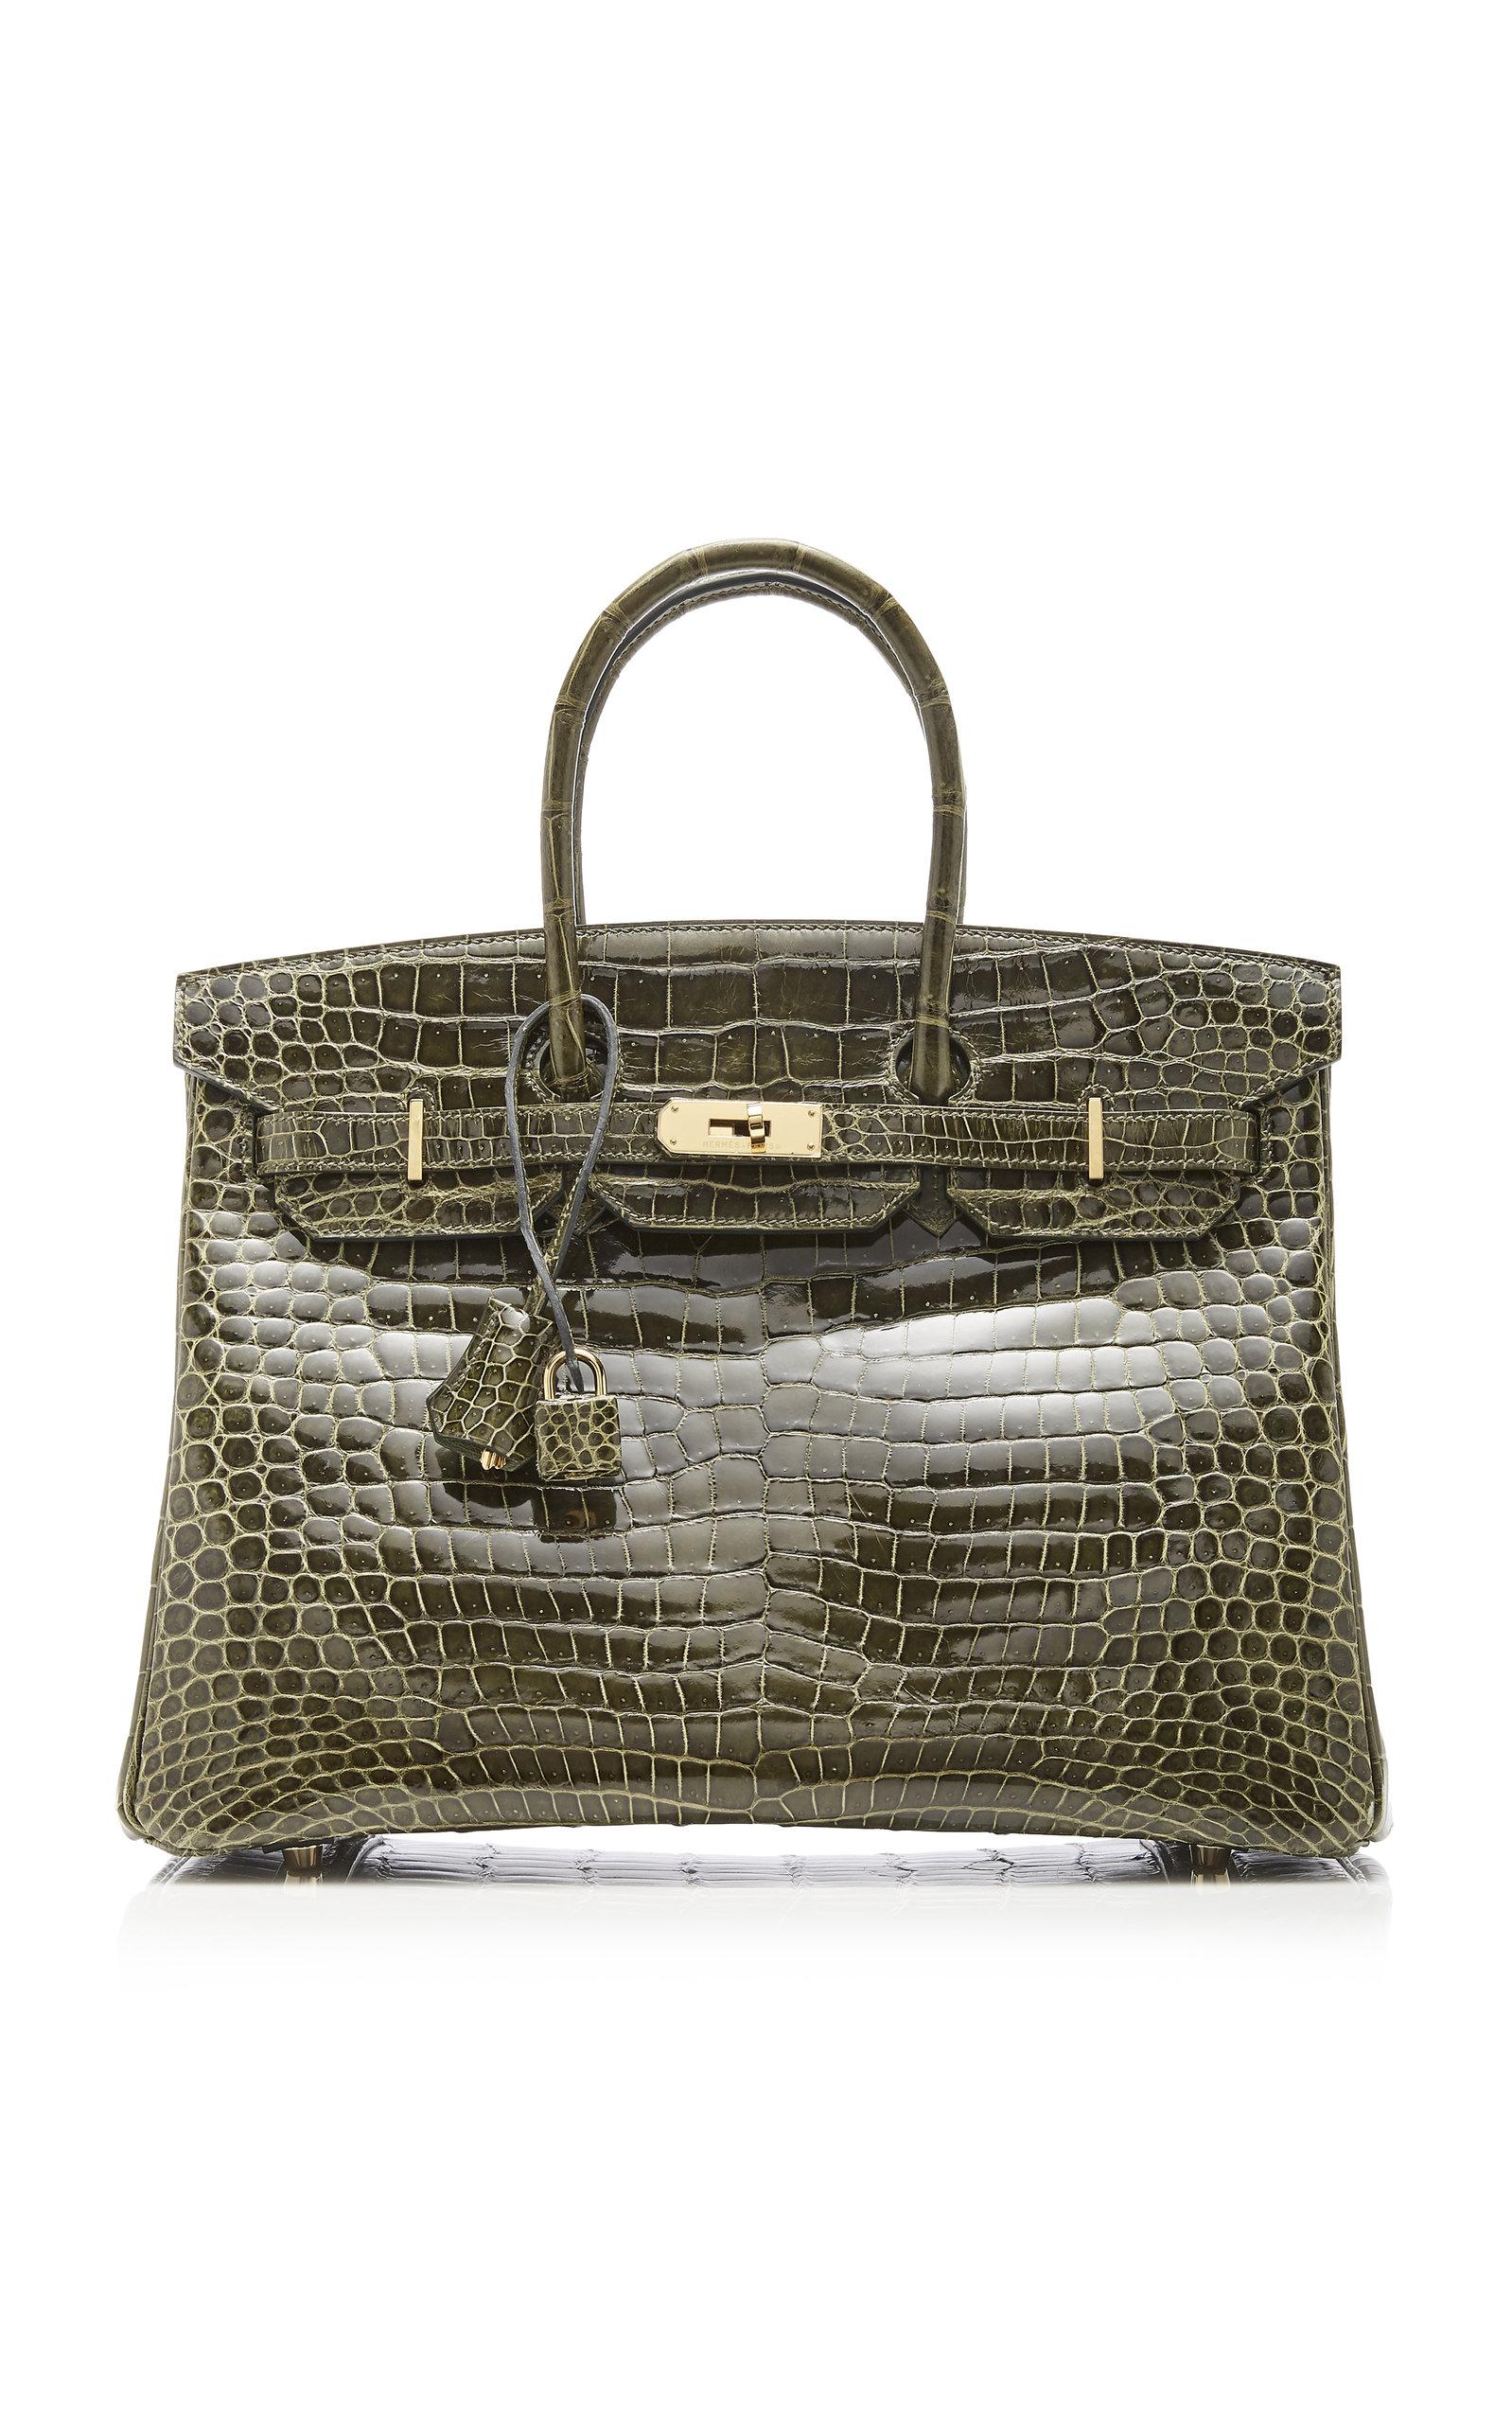 3427150195d0 Hermès Vintage by Heritage AuctionsHermès 35cm Vert Veronese Porosus  Crocodile Birkin